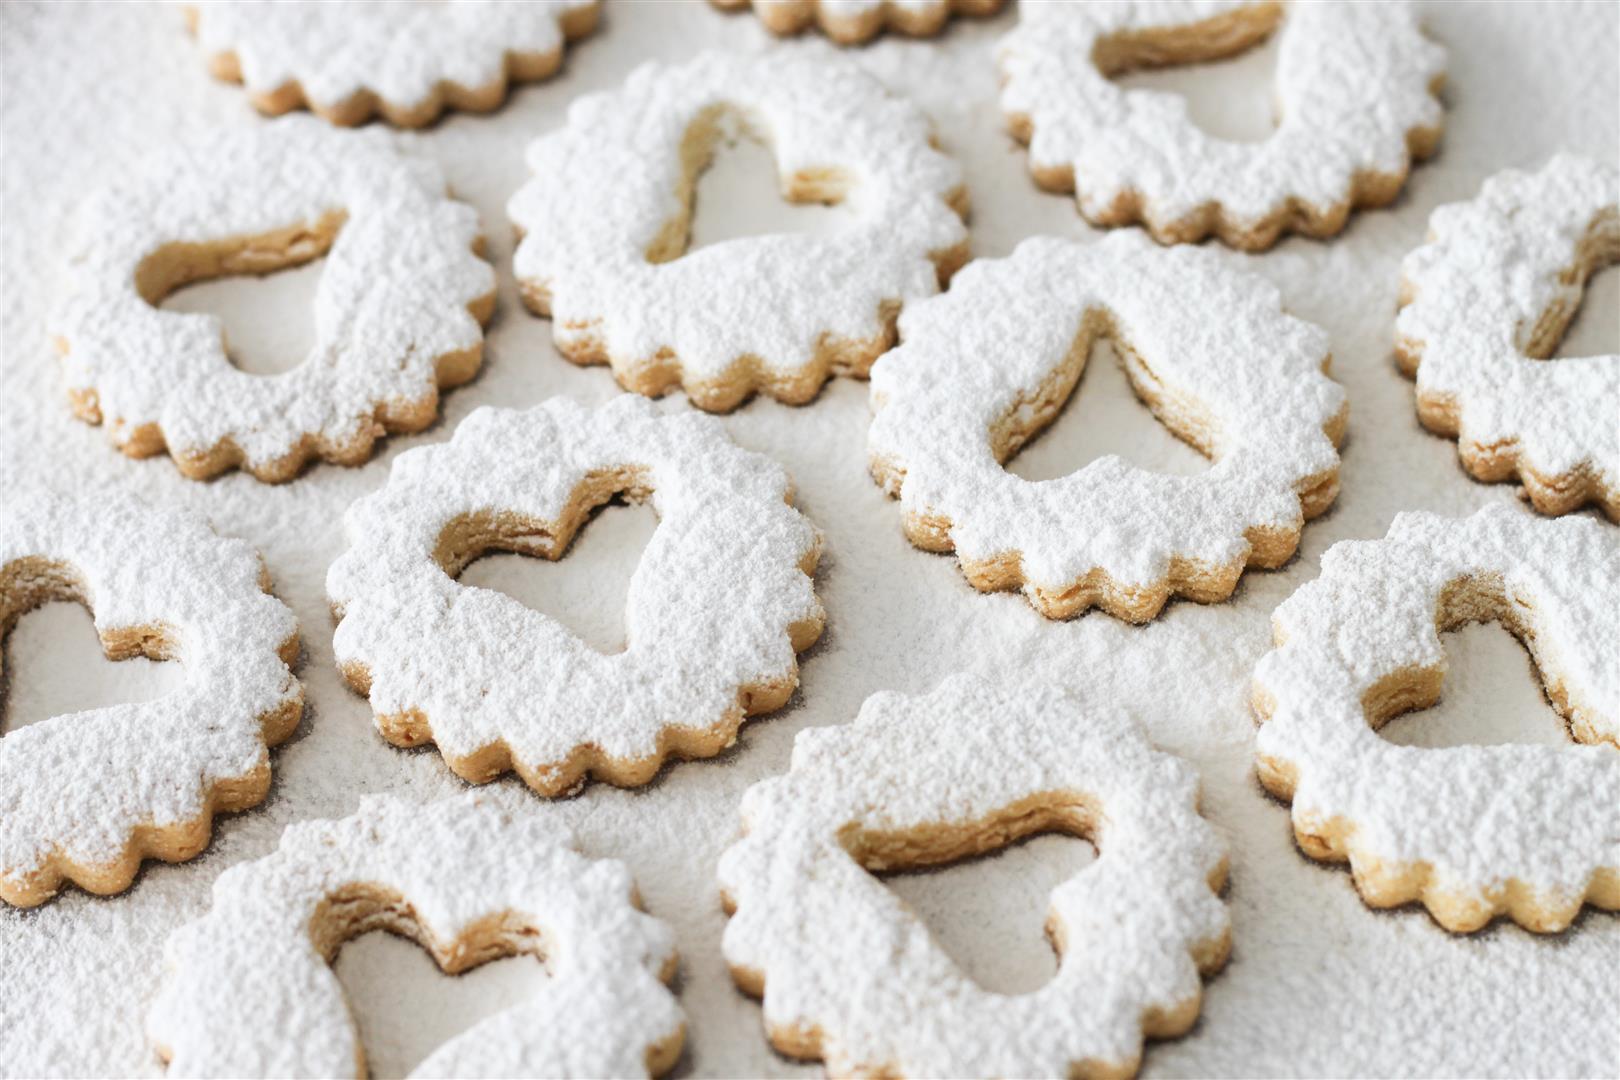 receta-galletas-mermelada-sin-gluten-celiacos-(2)